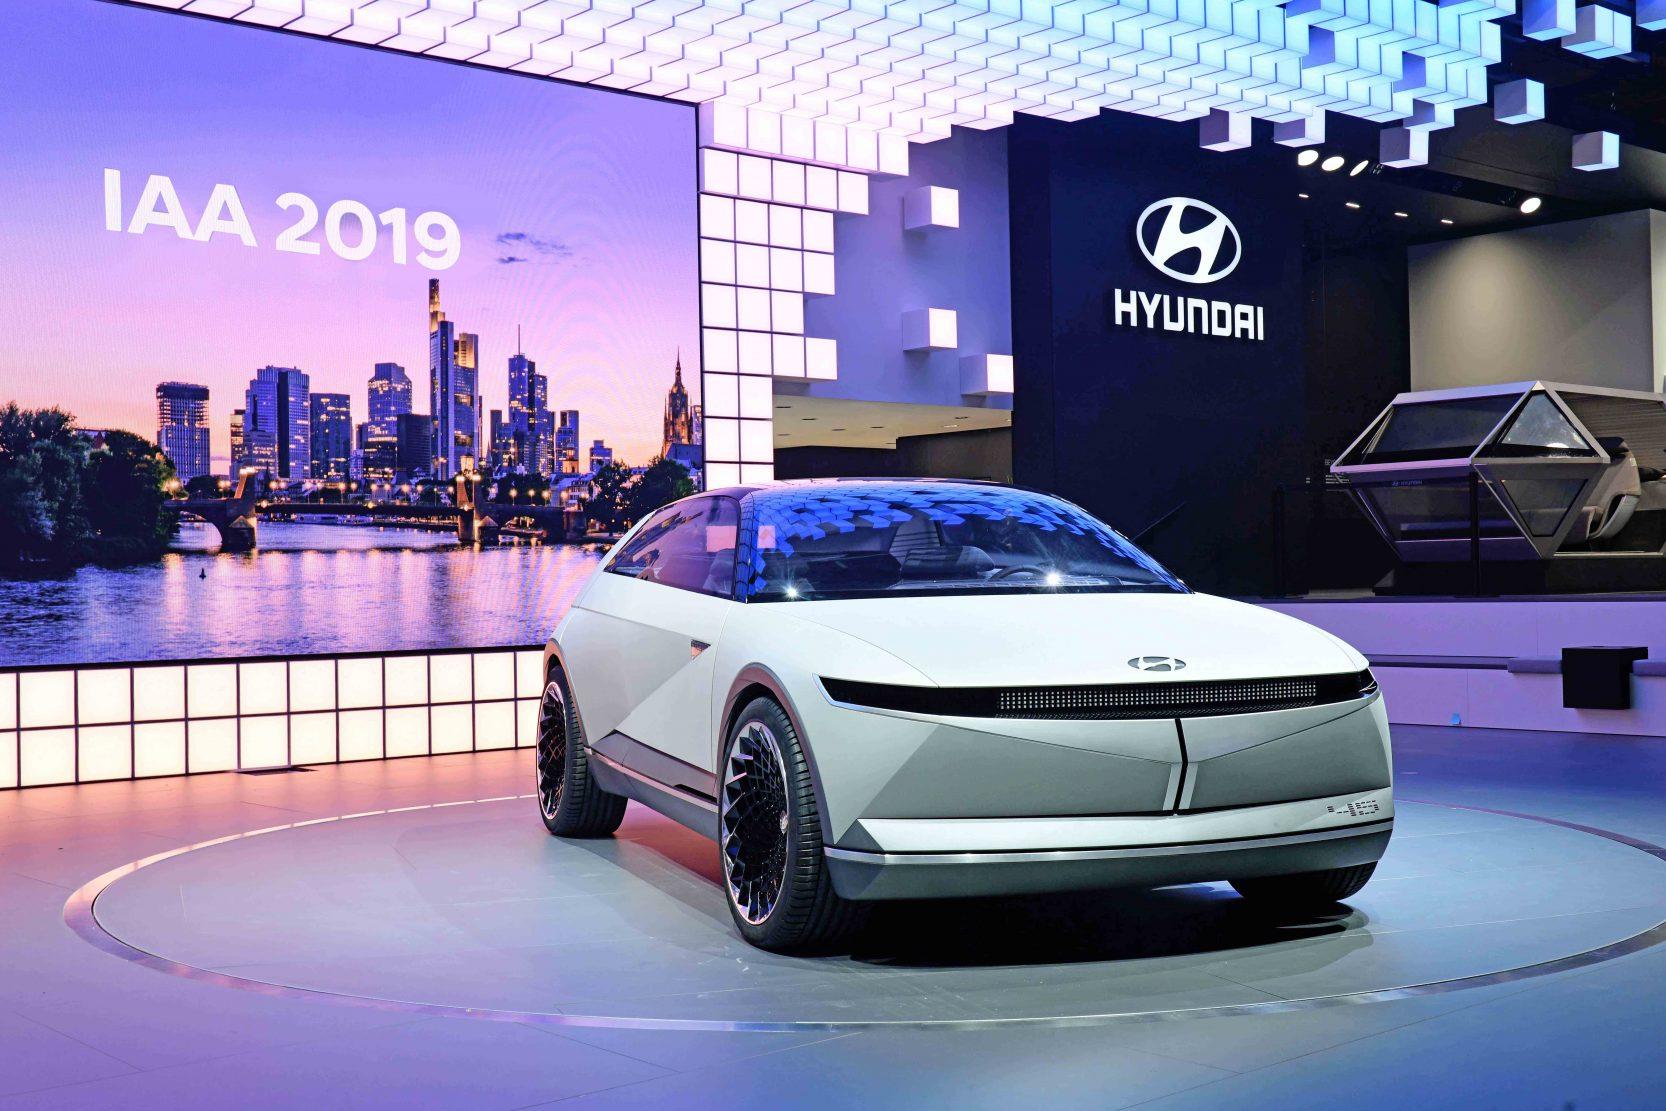 Hyundai Unveils 45 EV Concept to Define Future Through Heritage